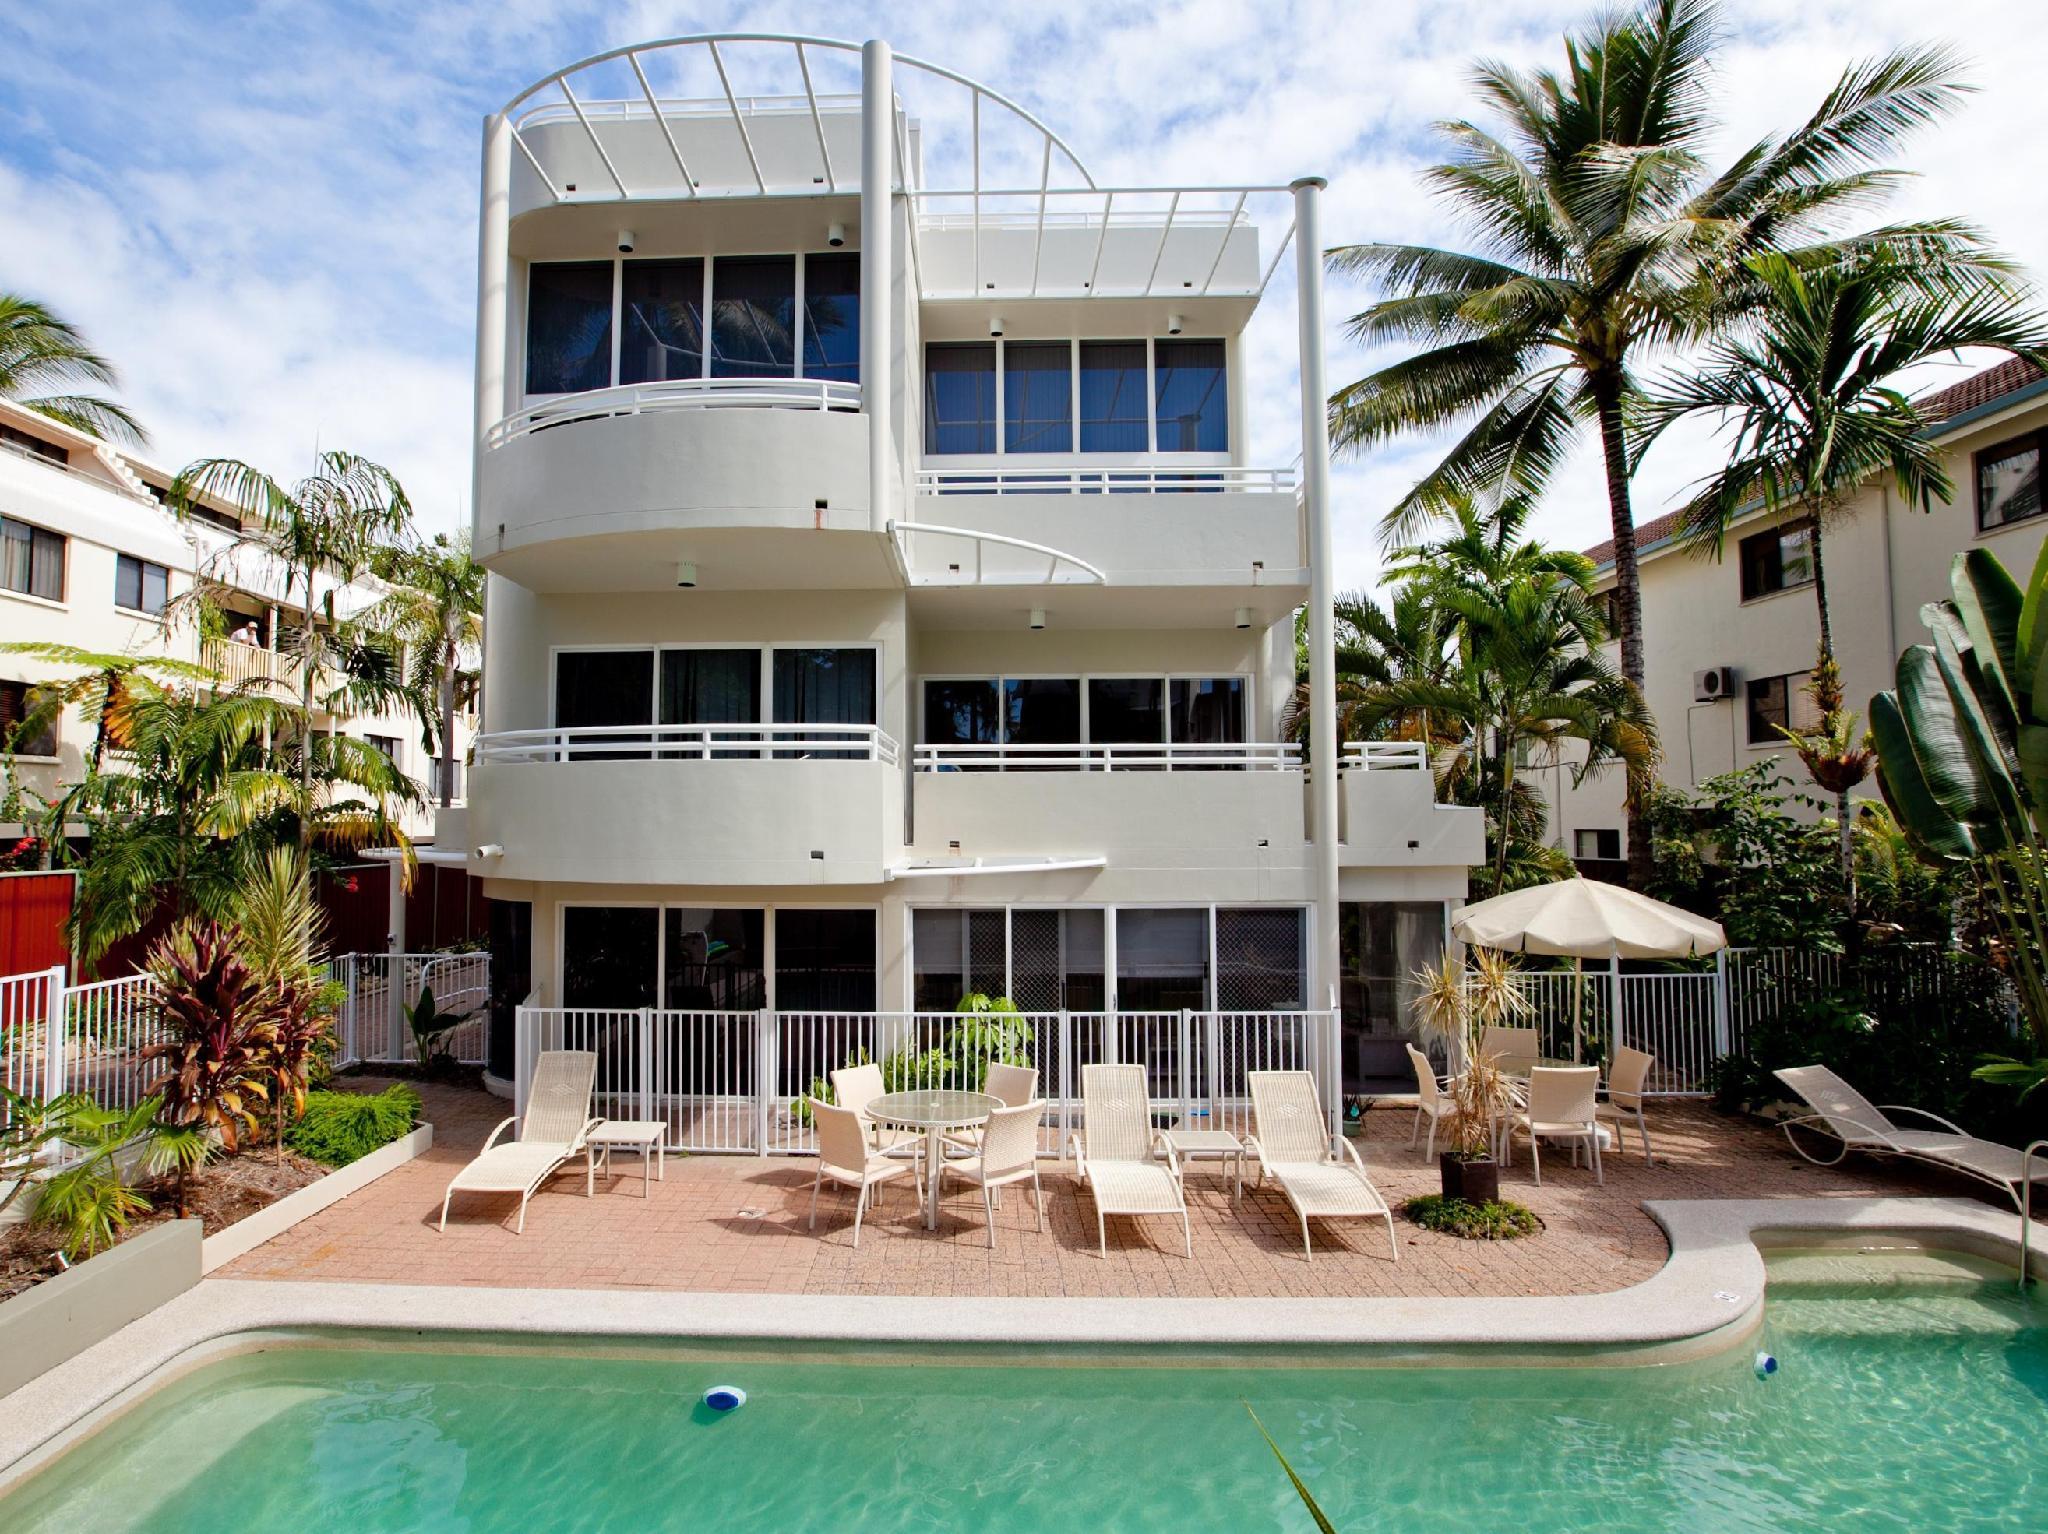 Latitude 16 Sunseeker Holiday Apartments